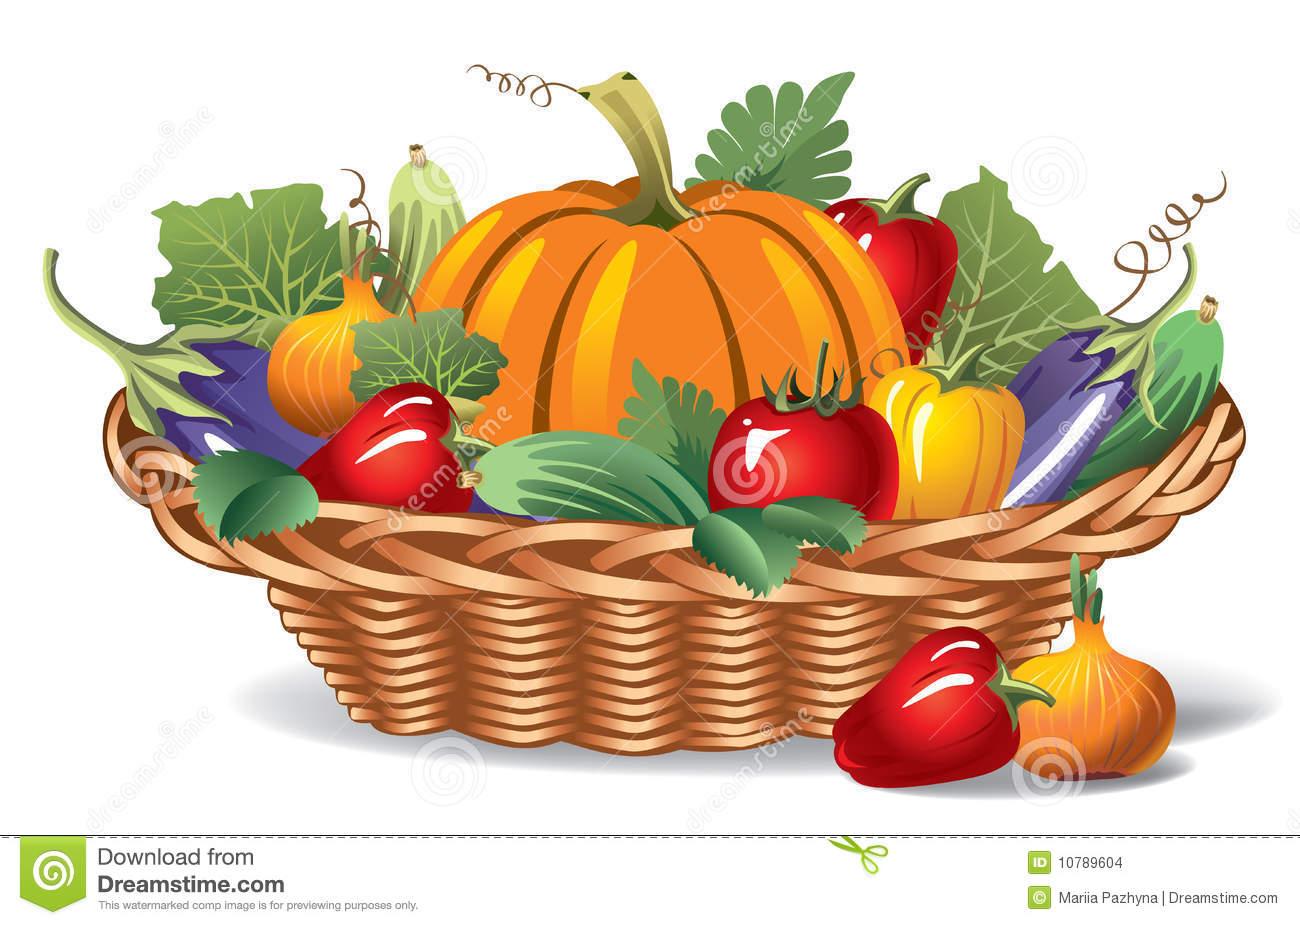 Рисунки корзин с овощами